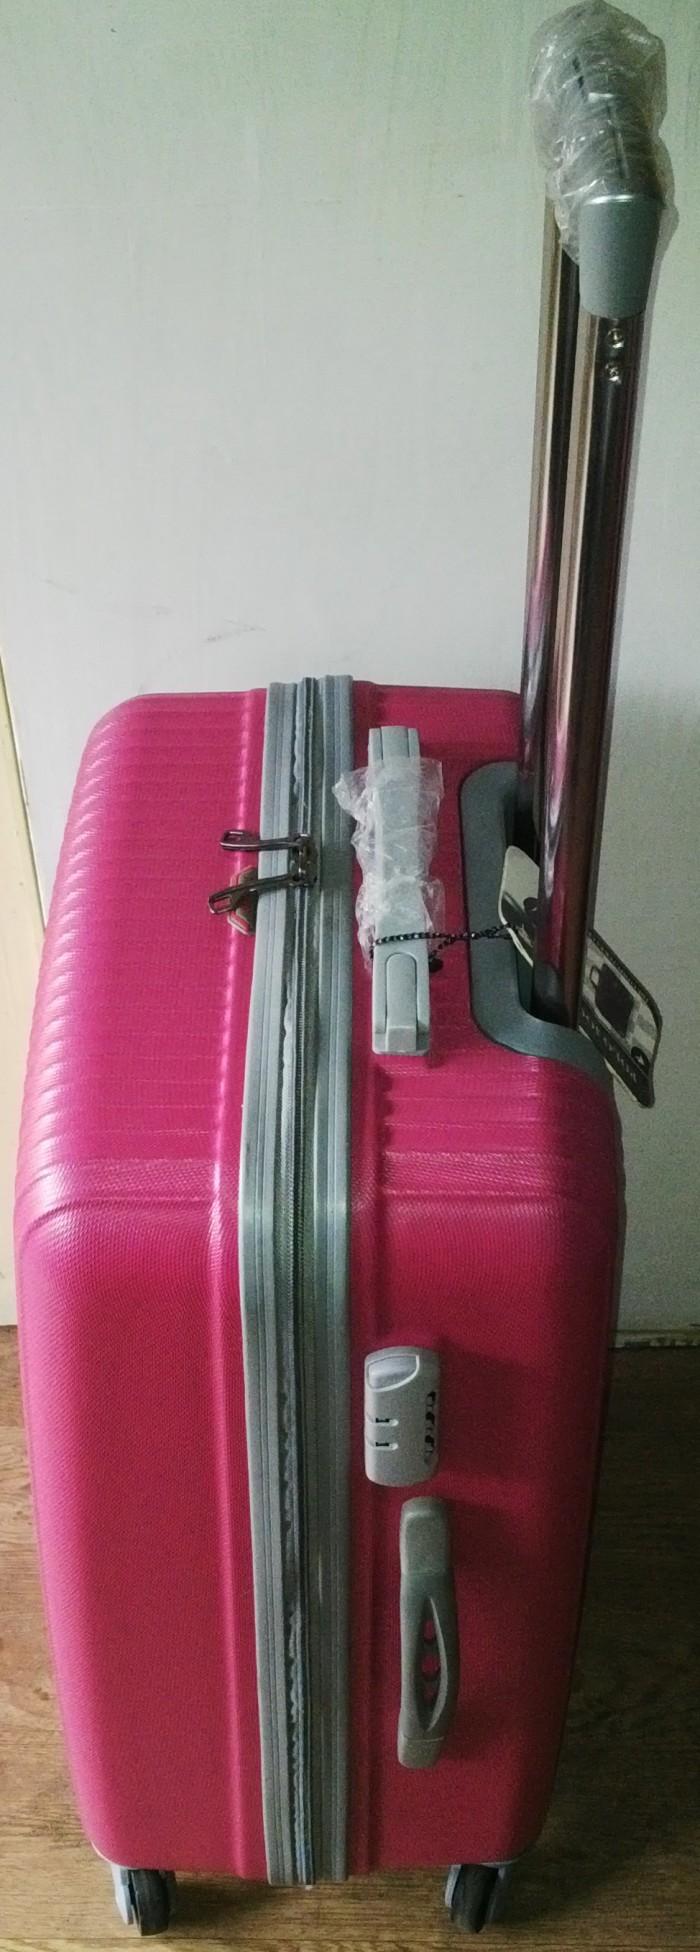 Jual Koper Travel Gaul Fiber Abs Polo Jockey 24 Inci Pink Garis Inchi